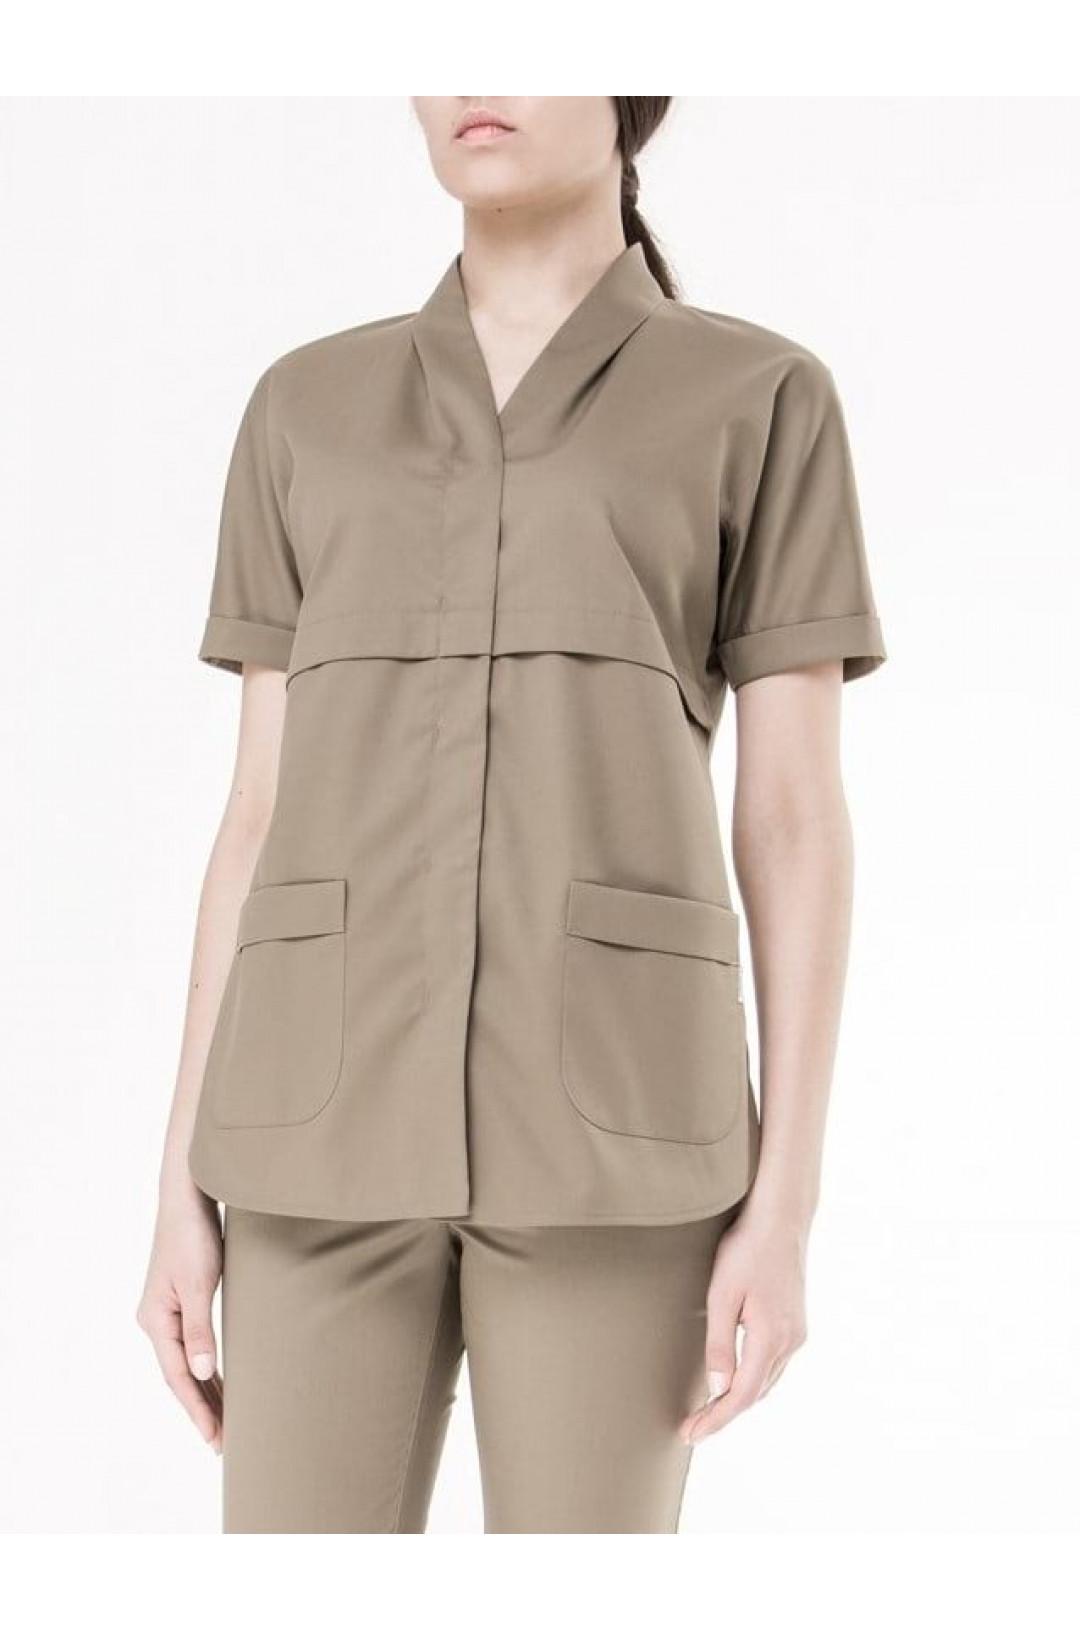 Блузка медицинская женская 8-1014 (Fallen Rock (серый), экстрафлекс)